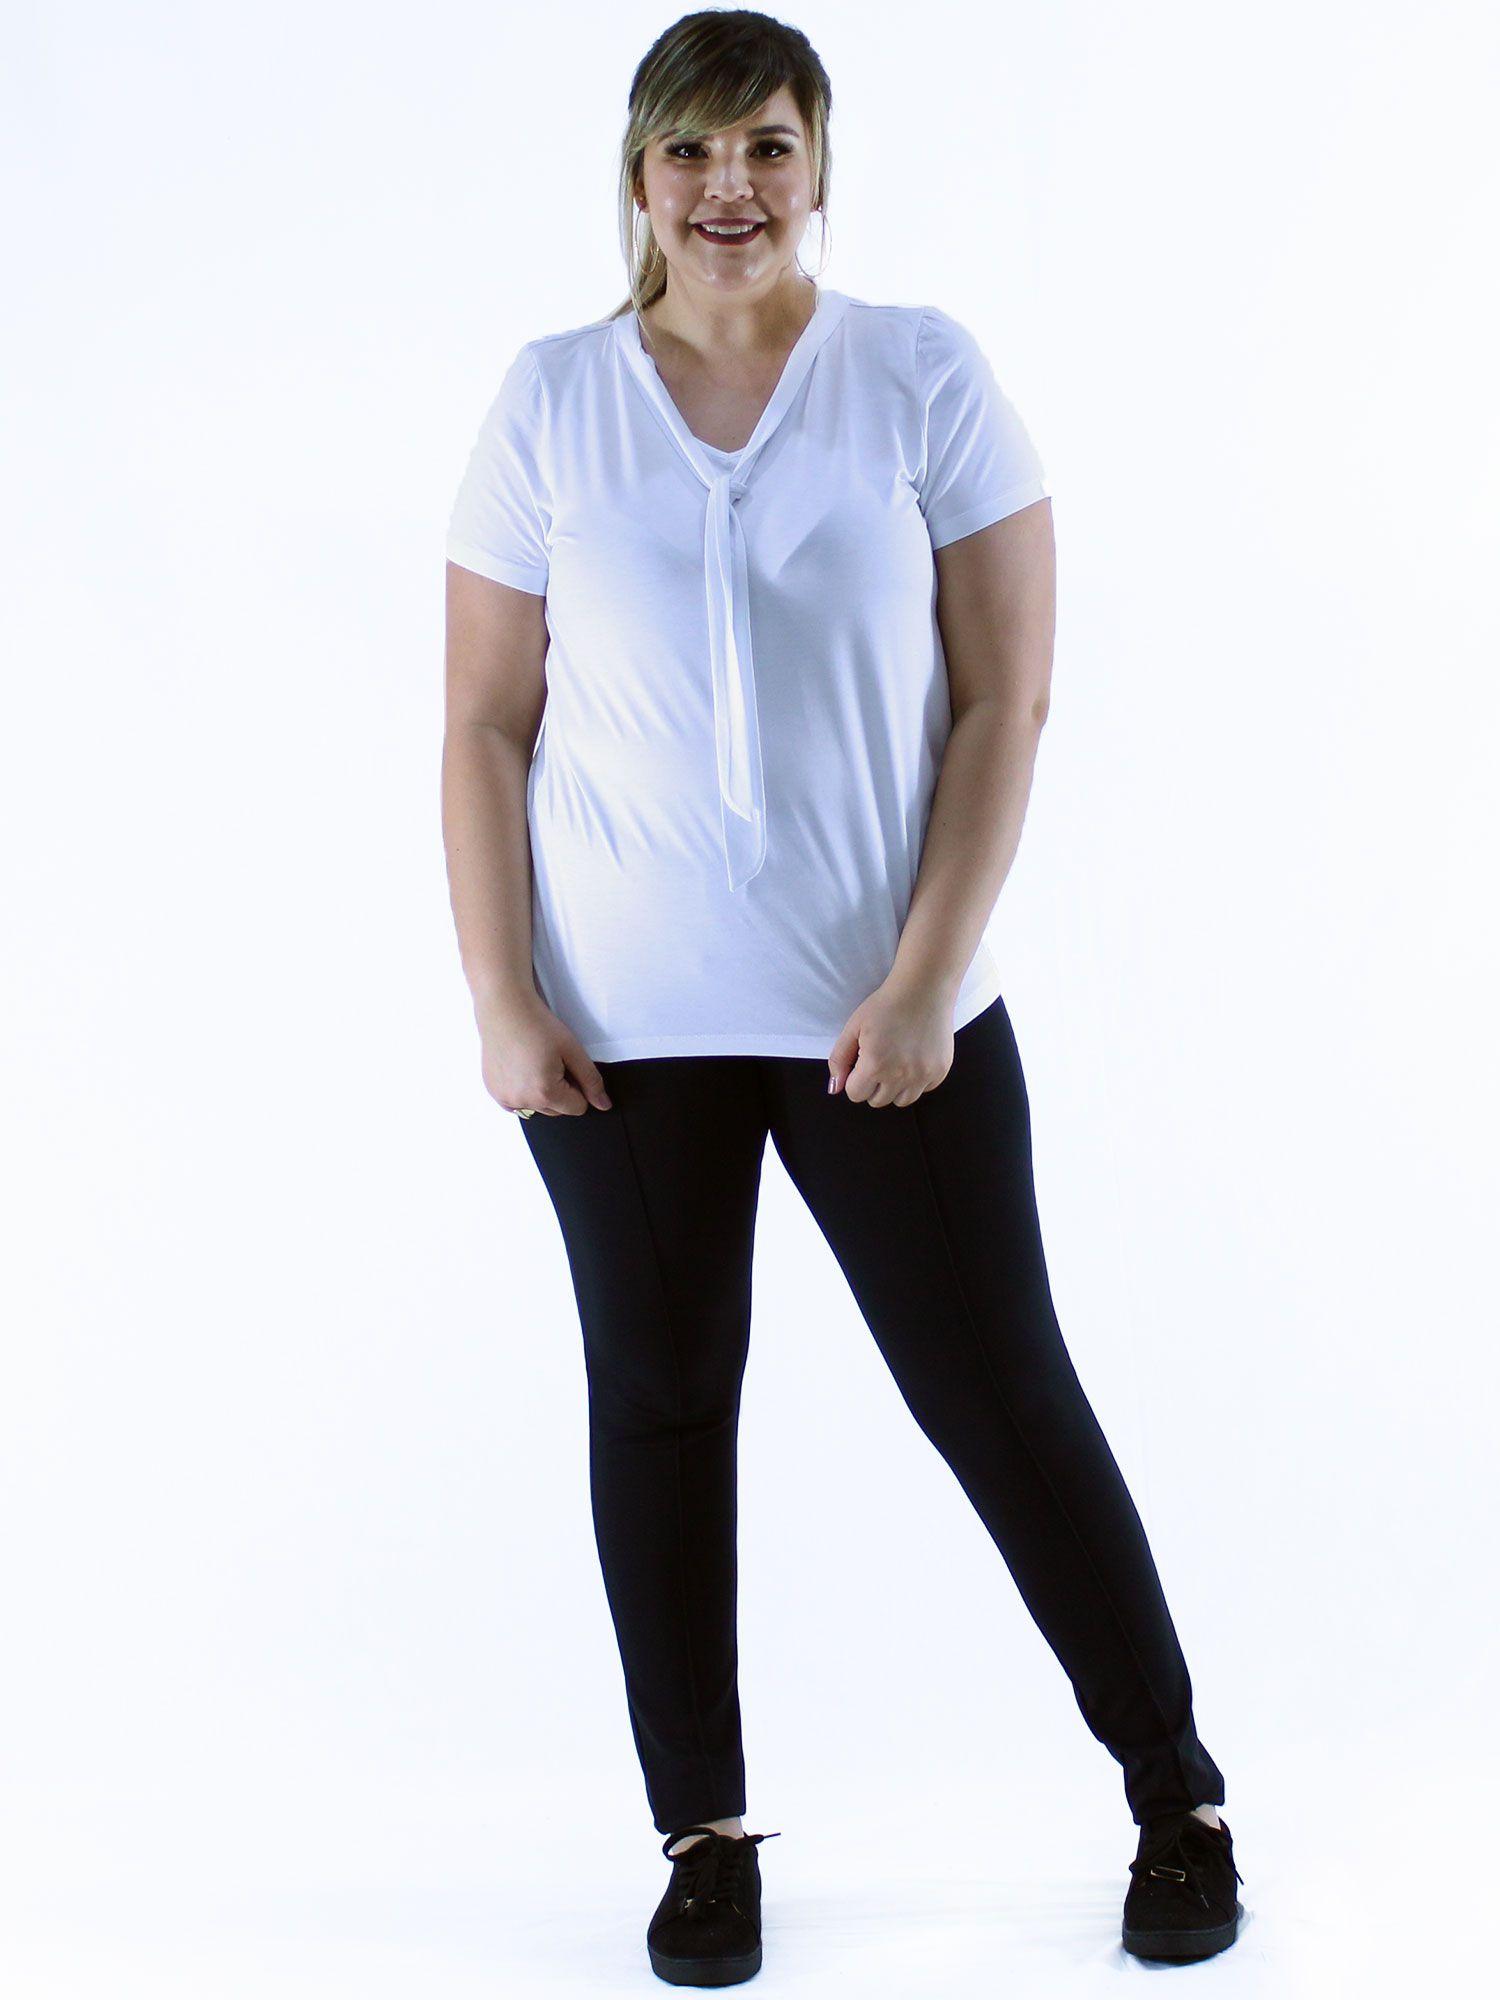 Blusa Plus Size KTS Decote Laço Branco